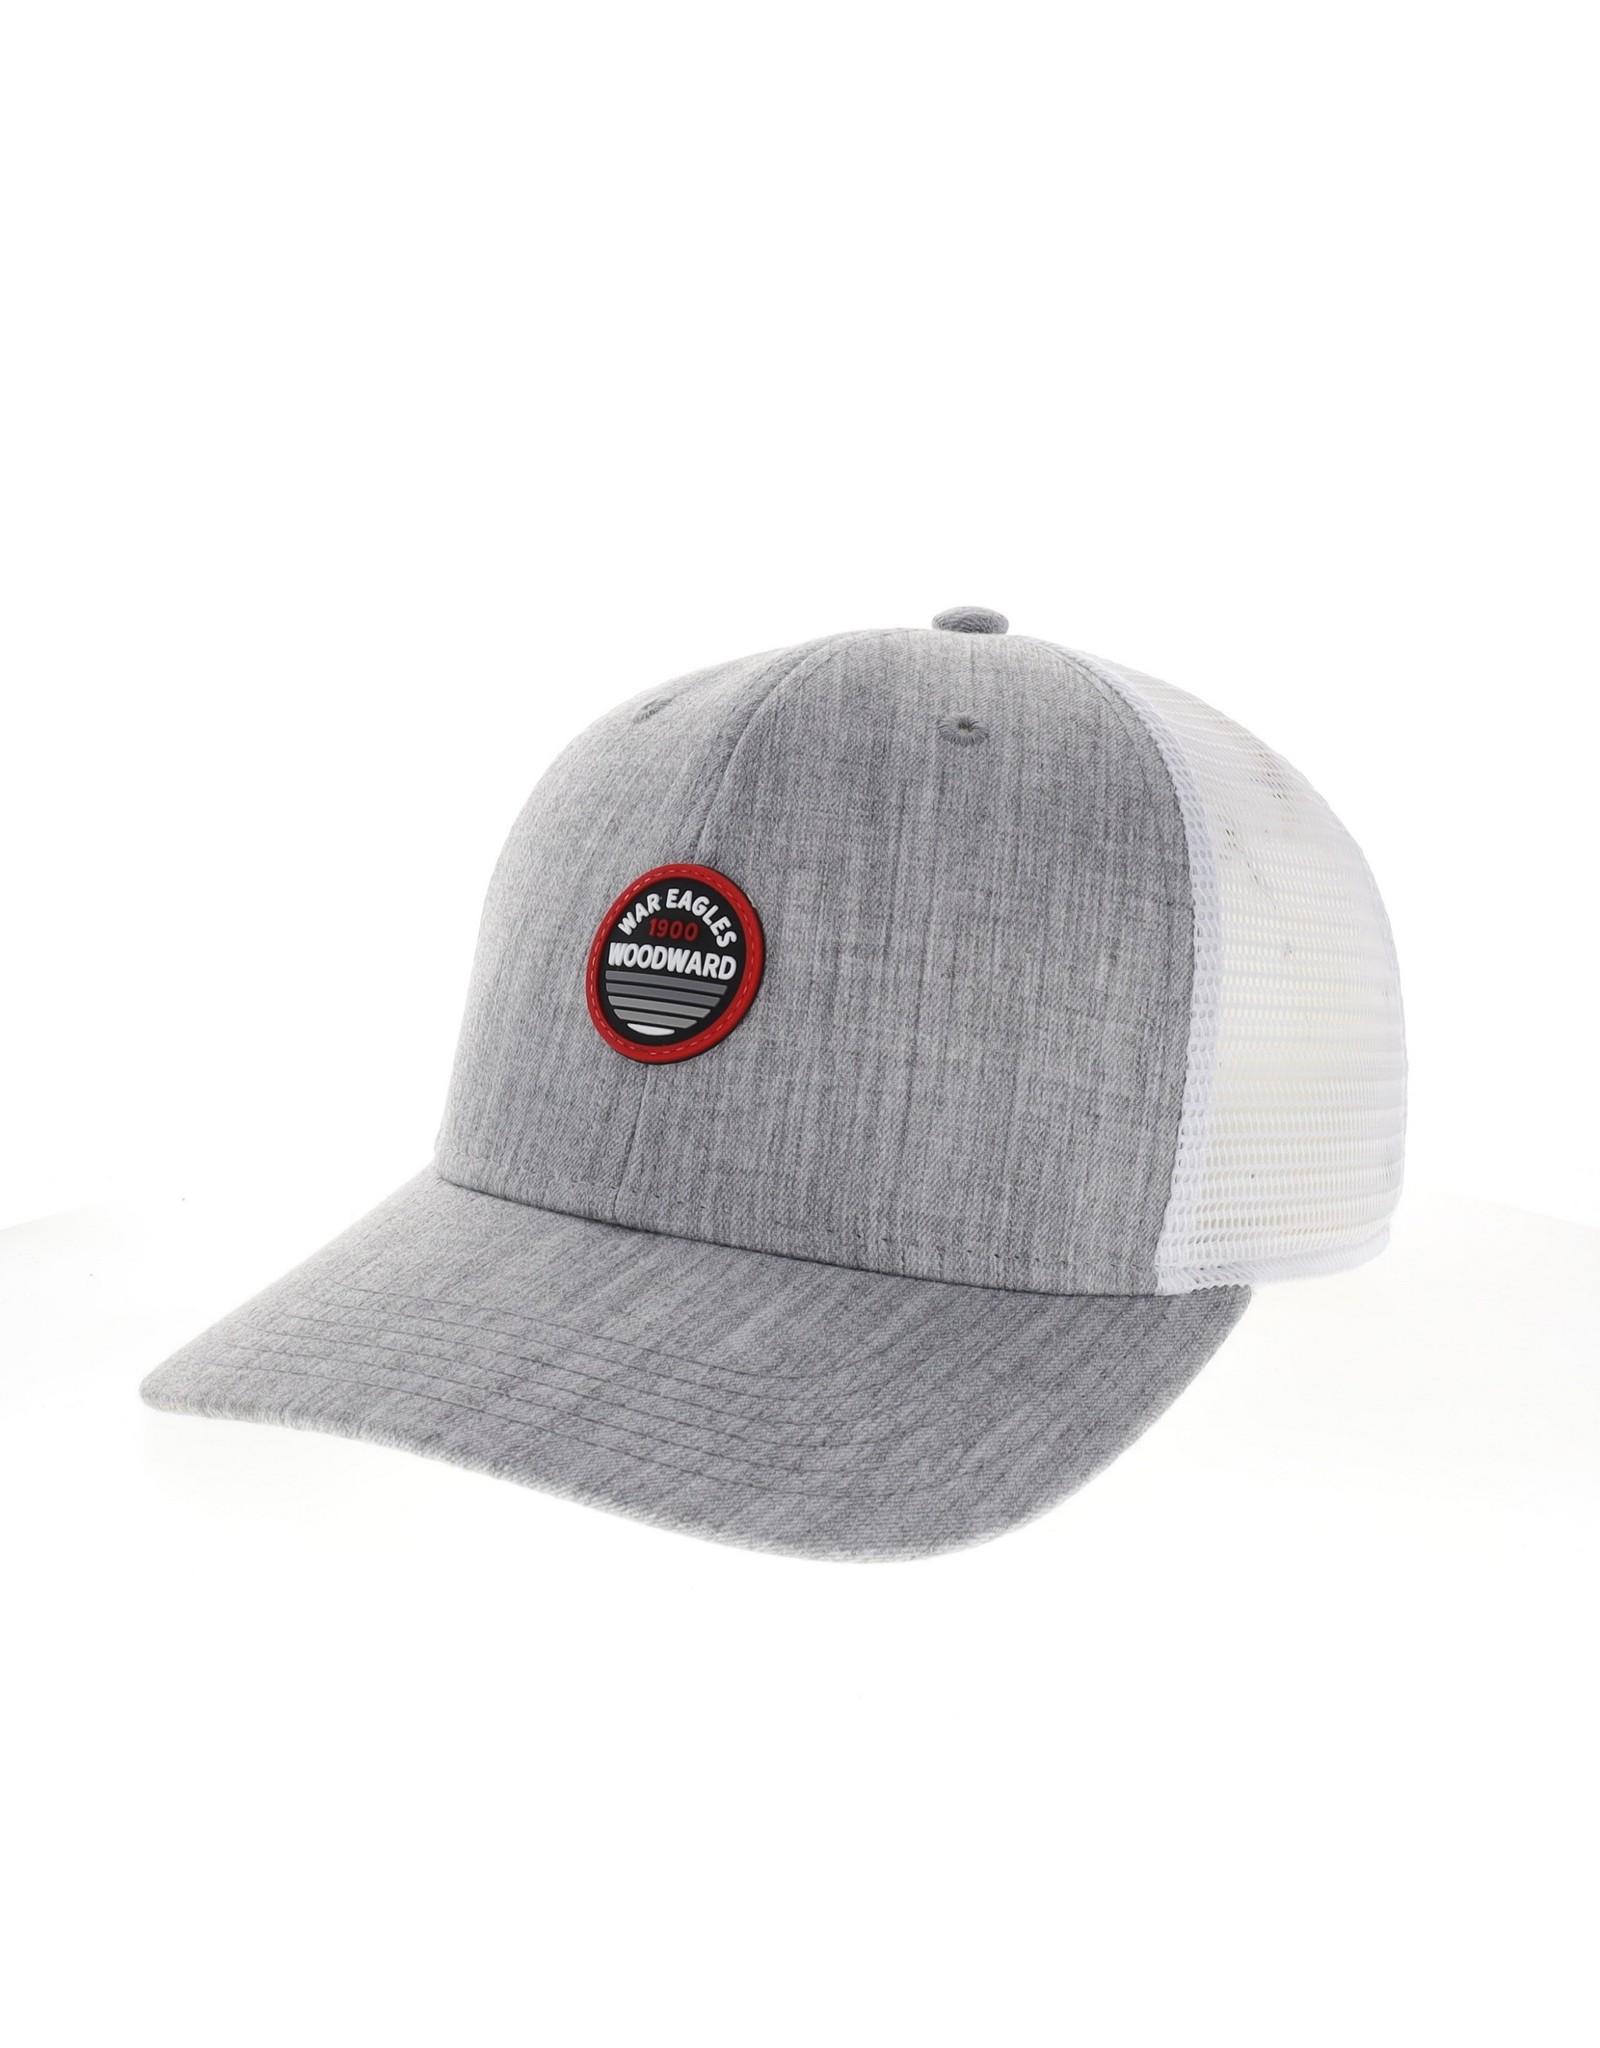 Legacy  Mid-Pro Snapback Trucker Cap in Malange Grey & White